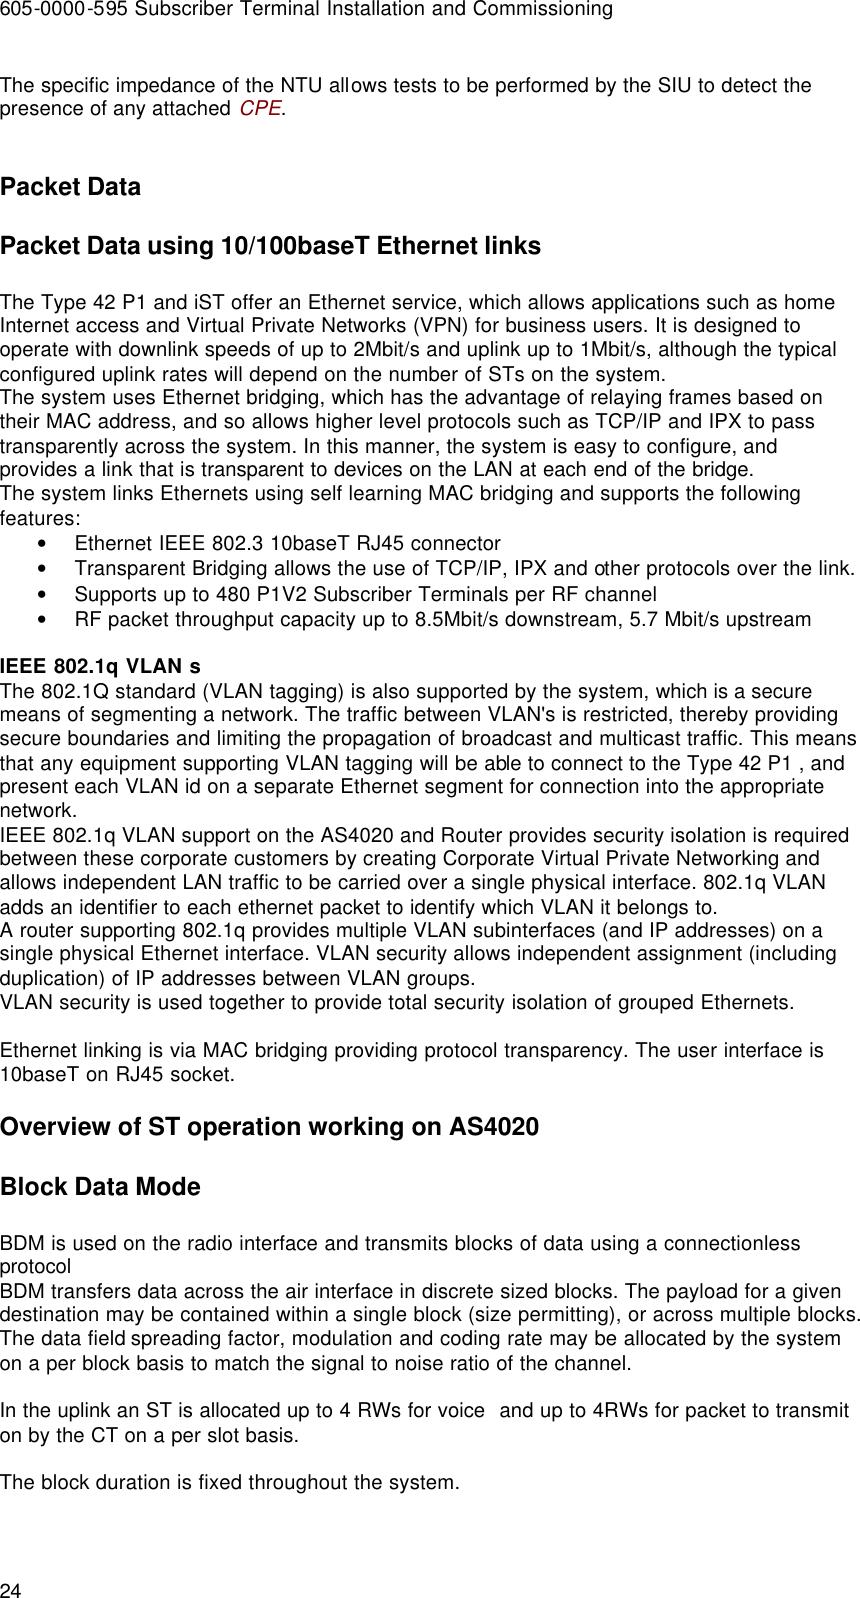 Airspan Communications STODU-PCS Subscriber Terminal User